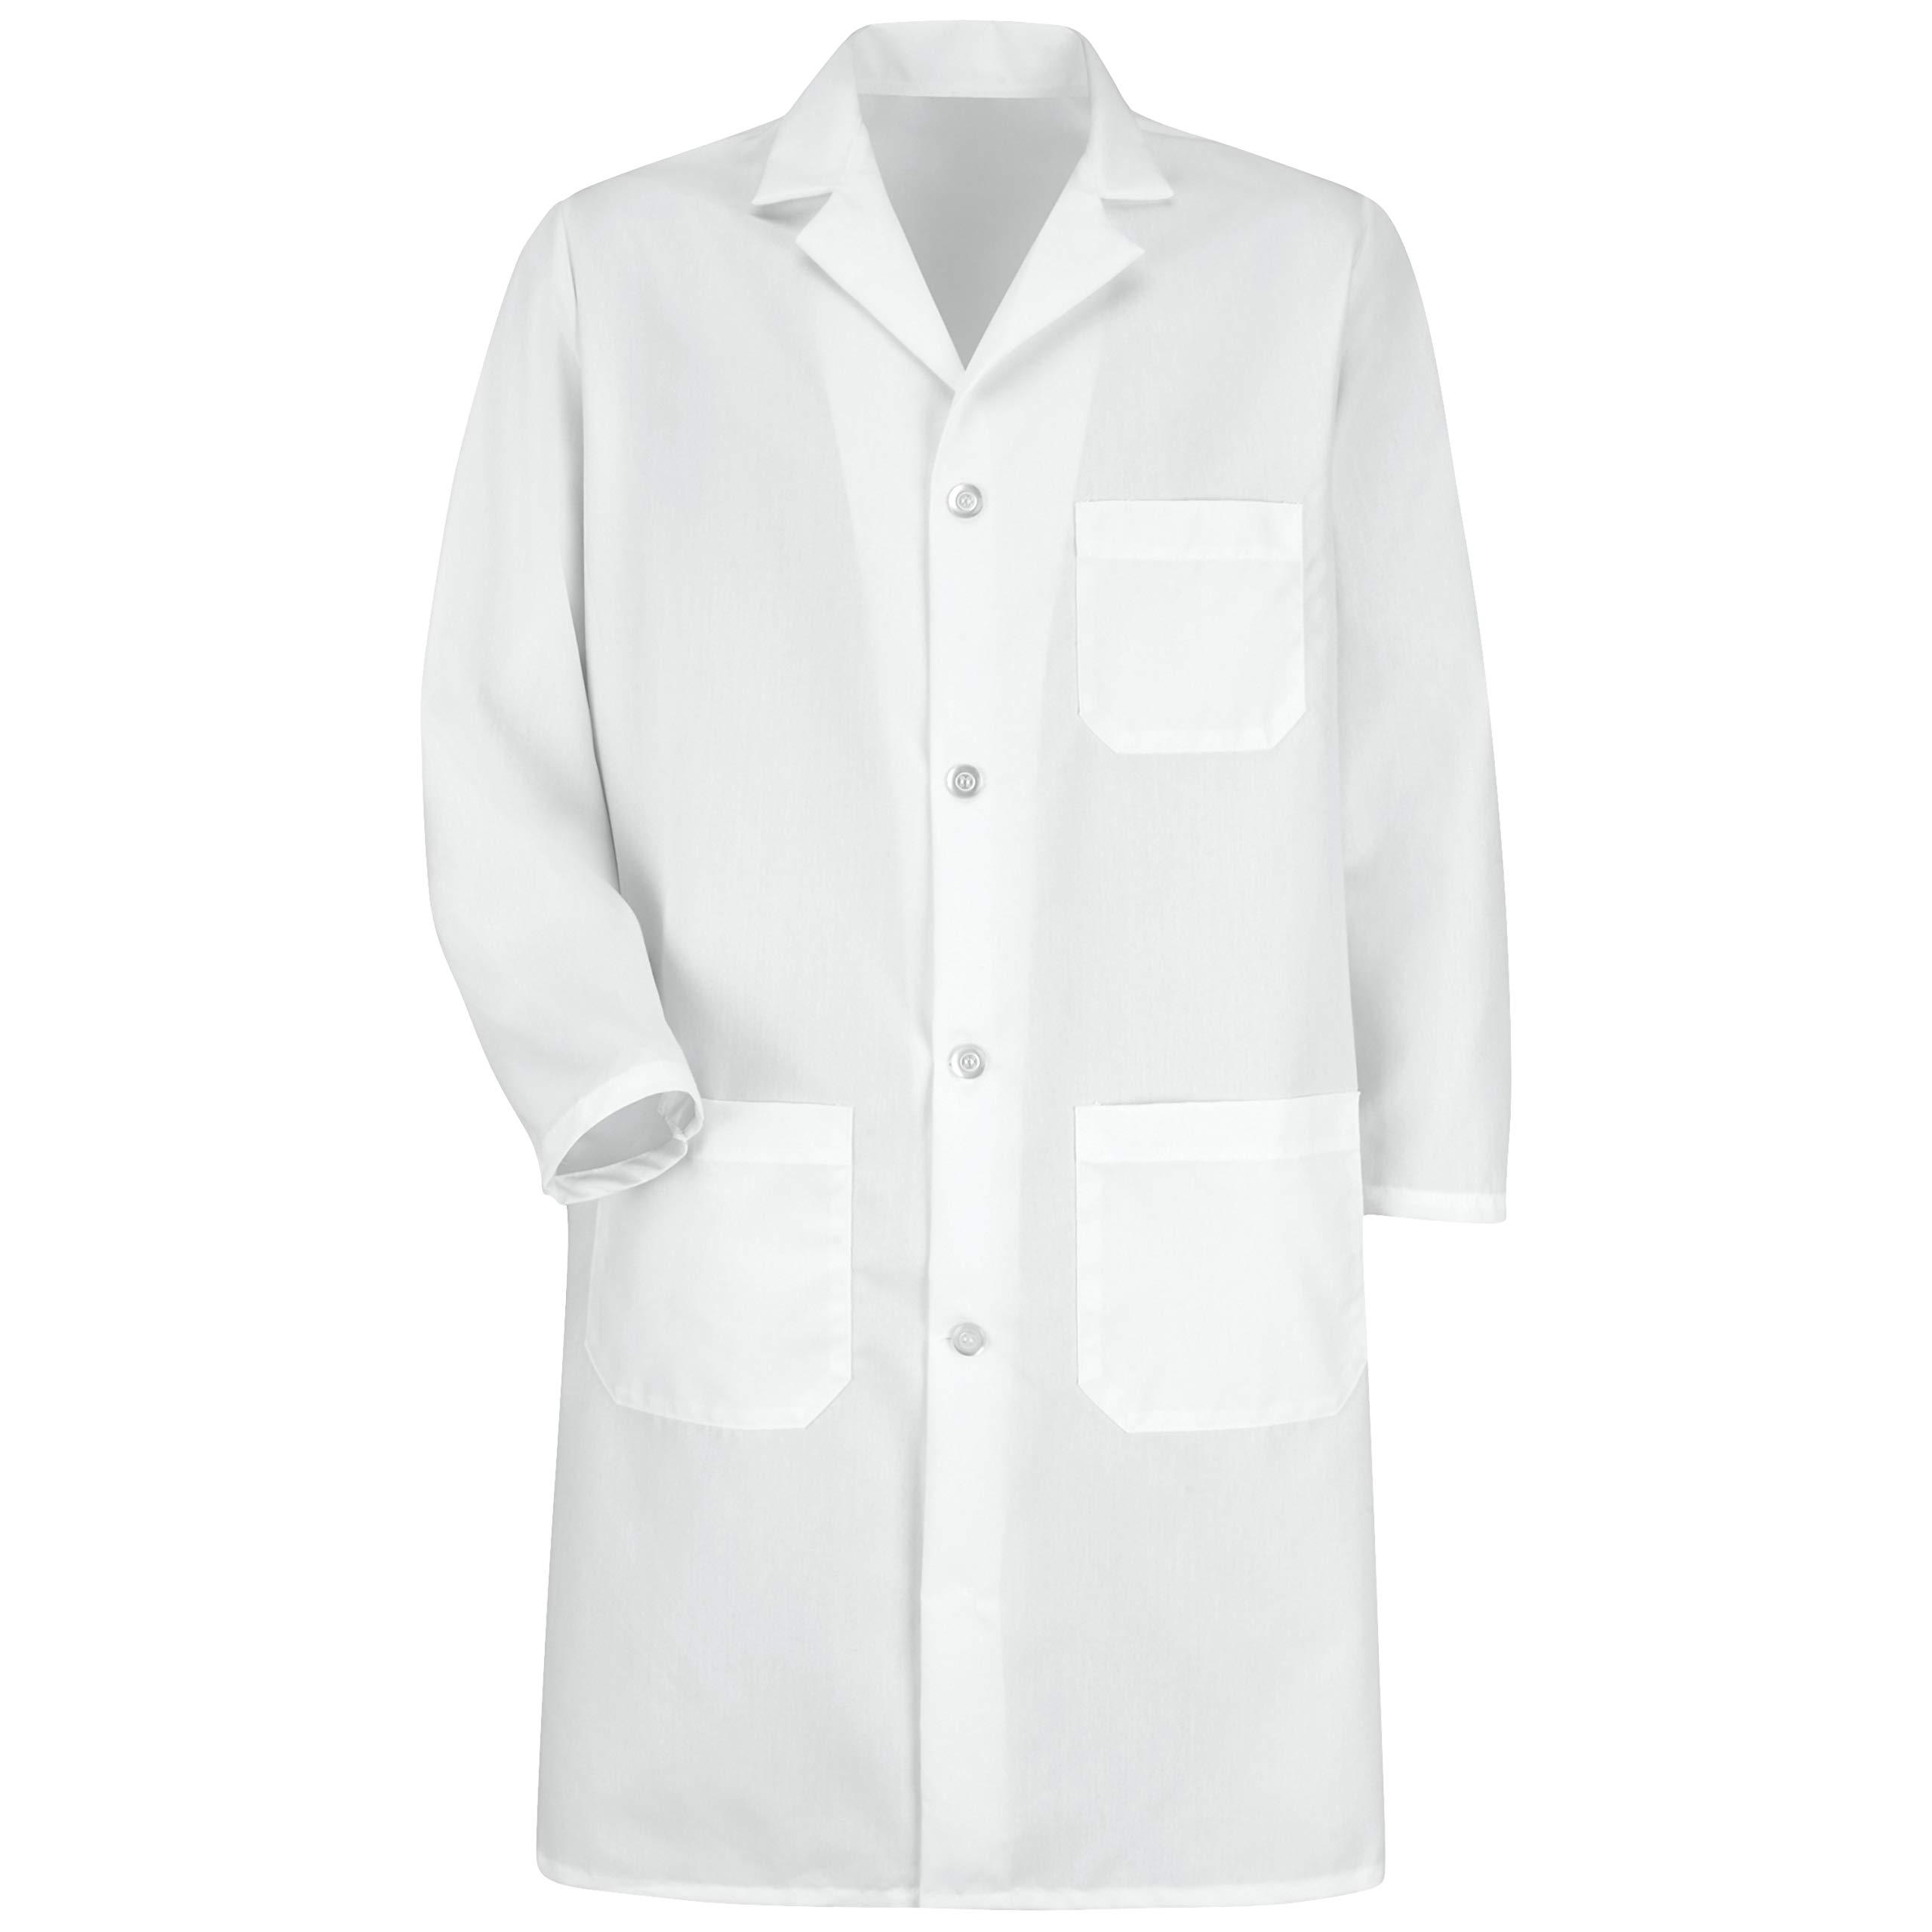 Red Kap Men's Exterior Pocket Lab Coat